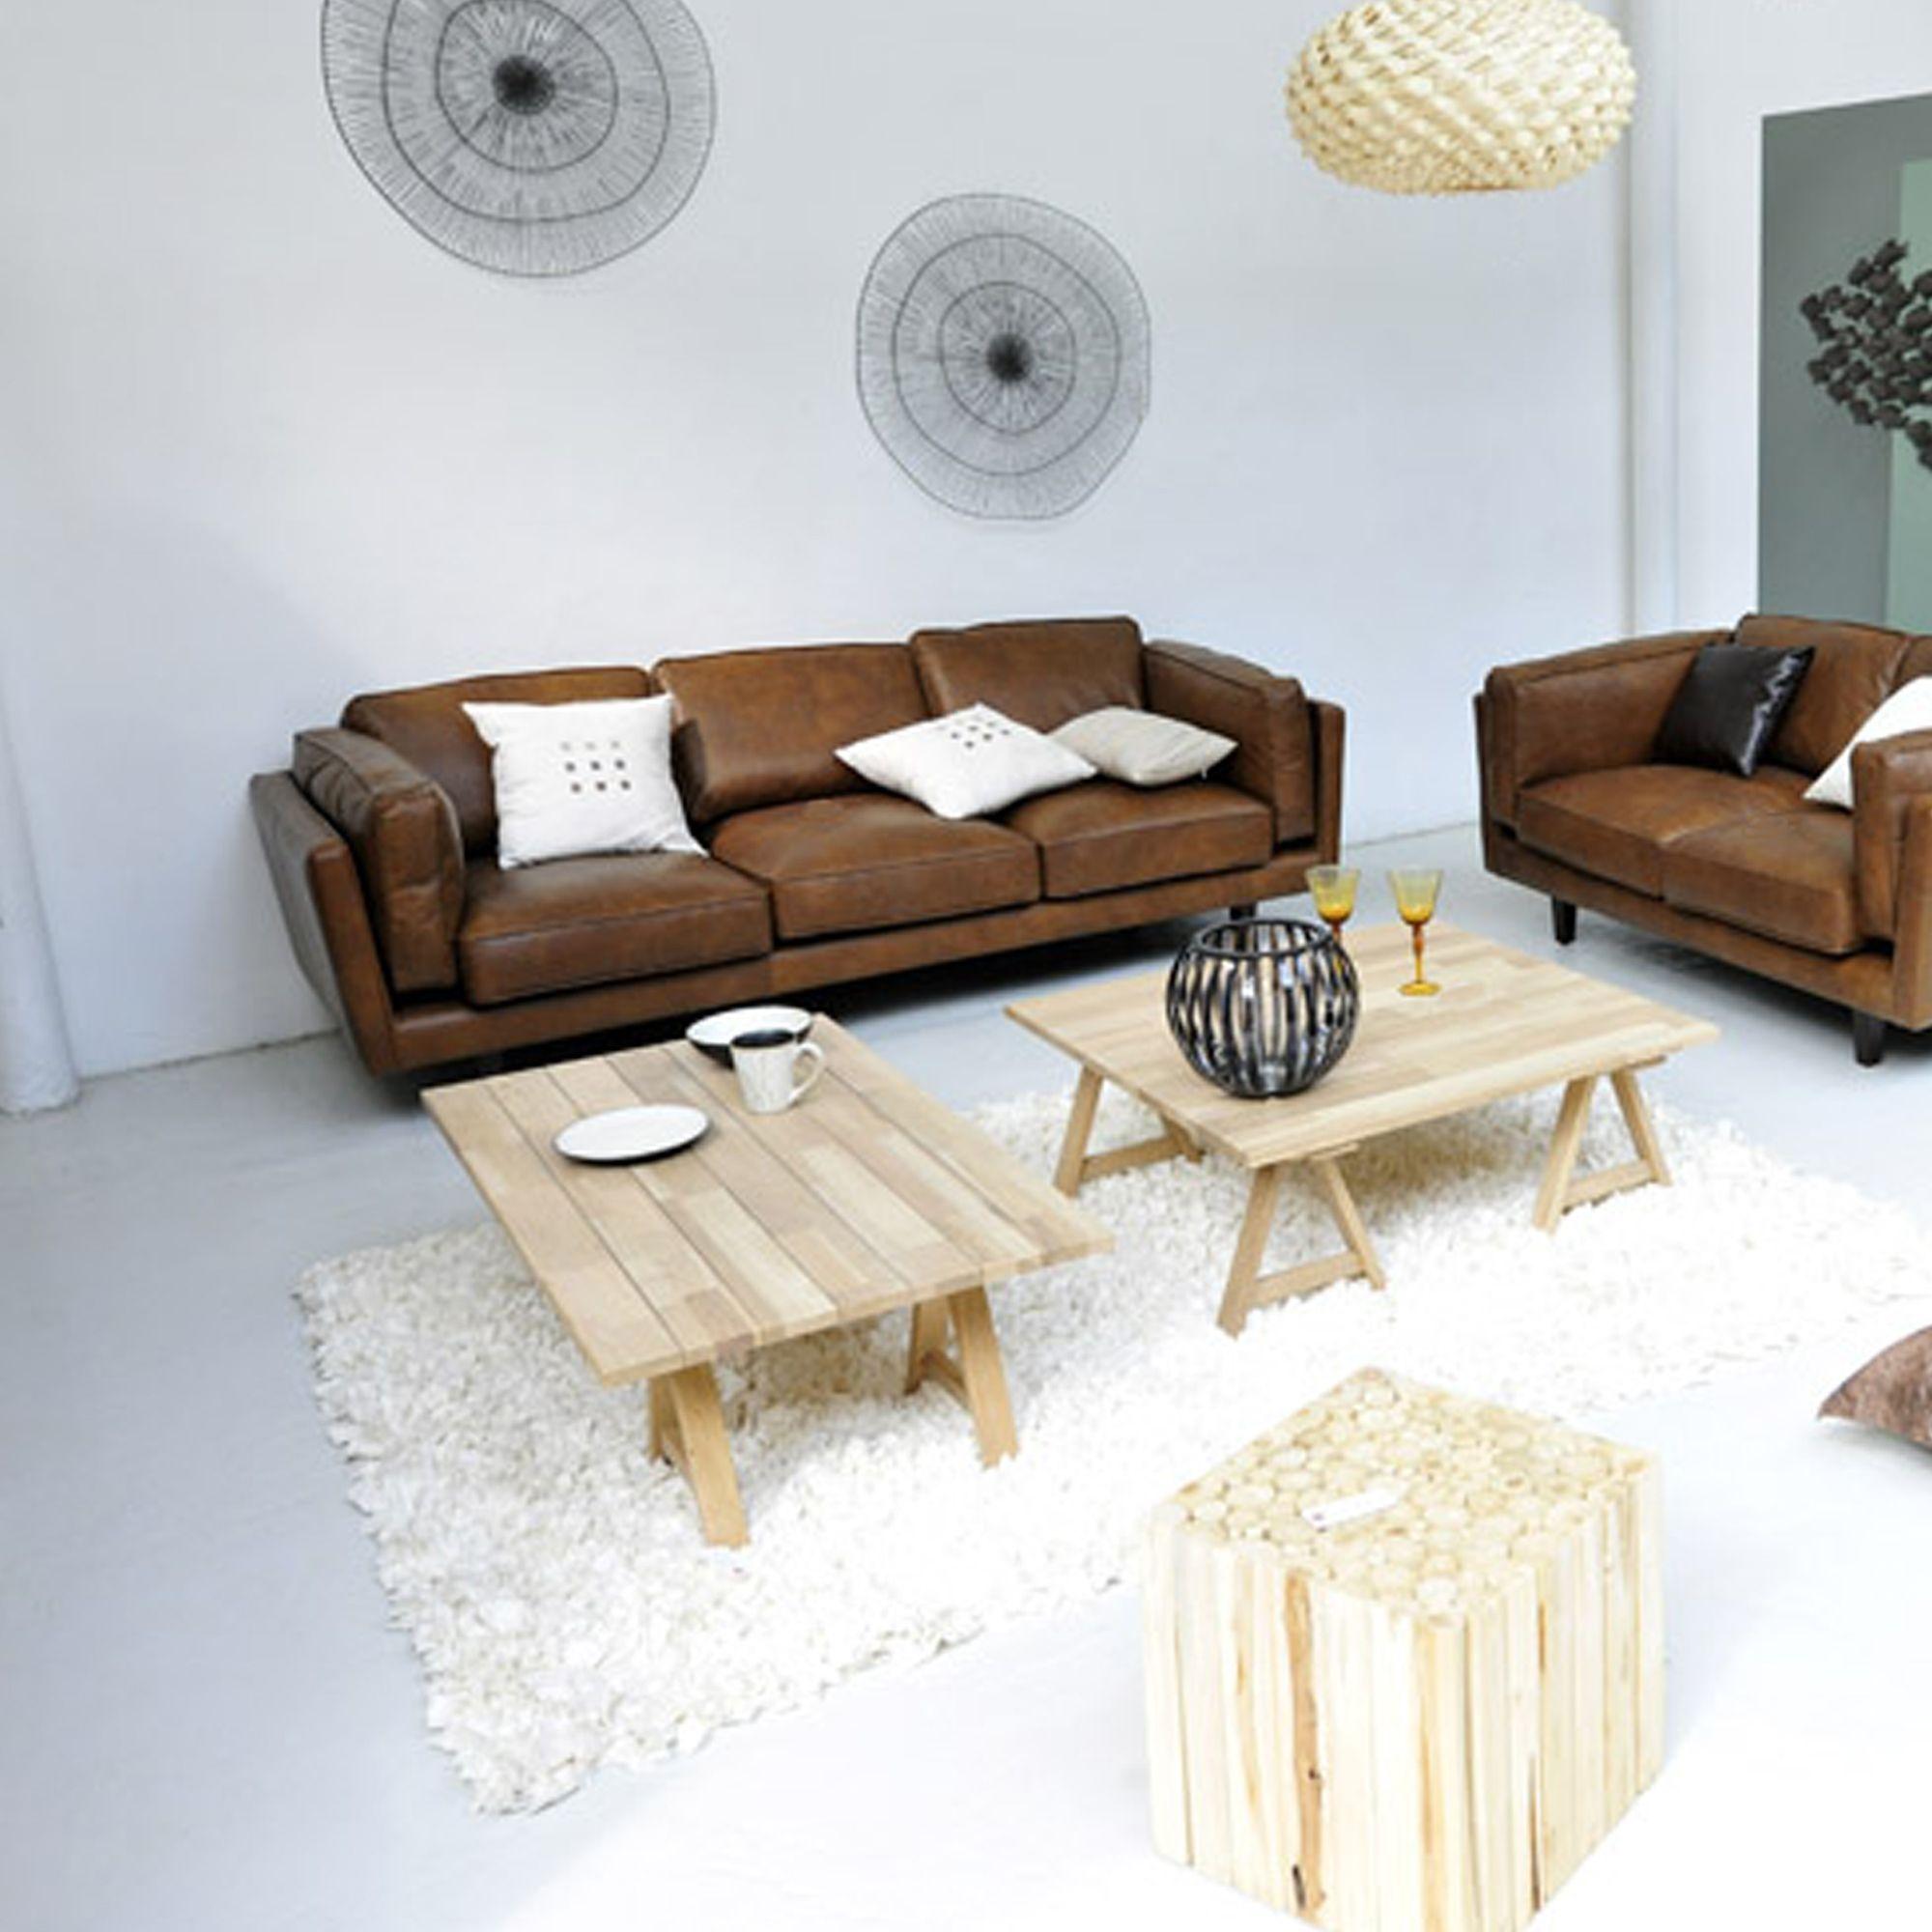 brooklyn salon canap s cuir canap s banquettes canap en cuir vachette 2 places home. Black Bedroom Furniture Sets. Home Design Ideas